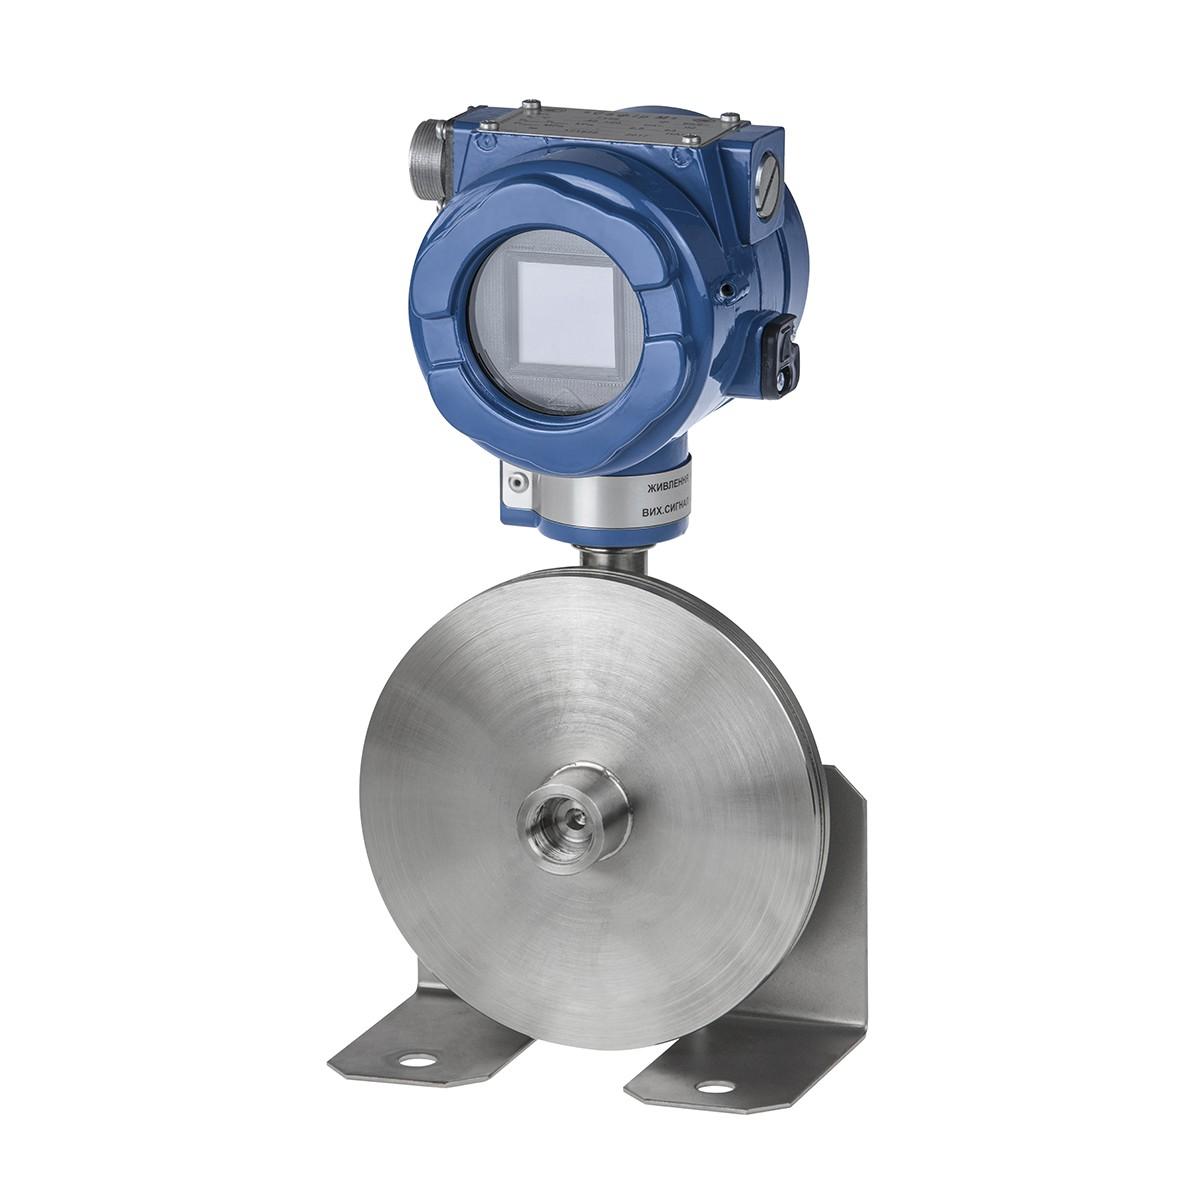 Smart Gauge Pressure Transmitters Safir-M 7101, 7201, 7301